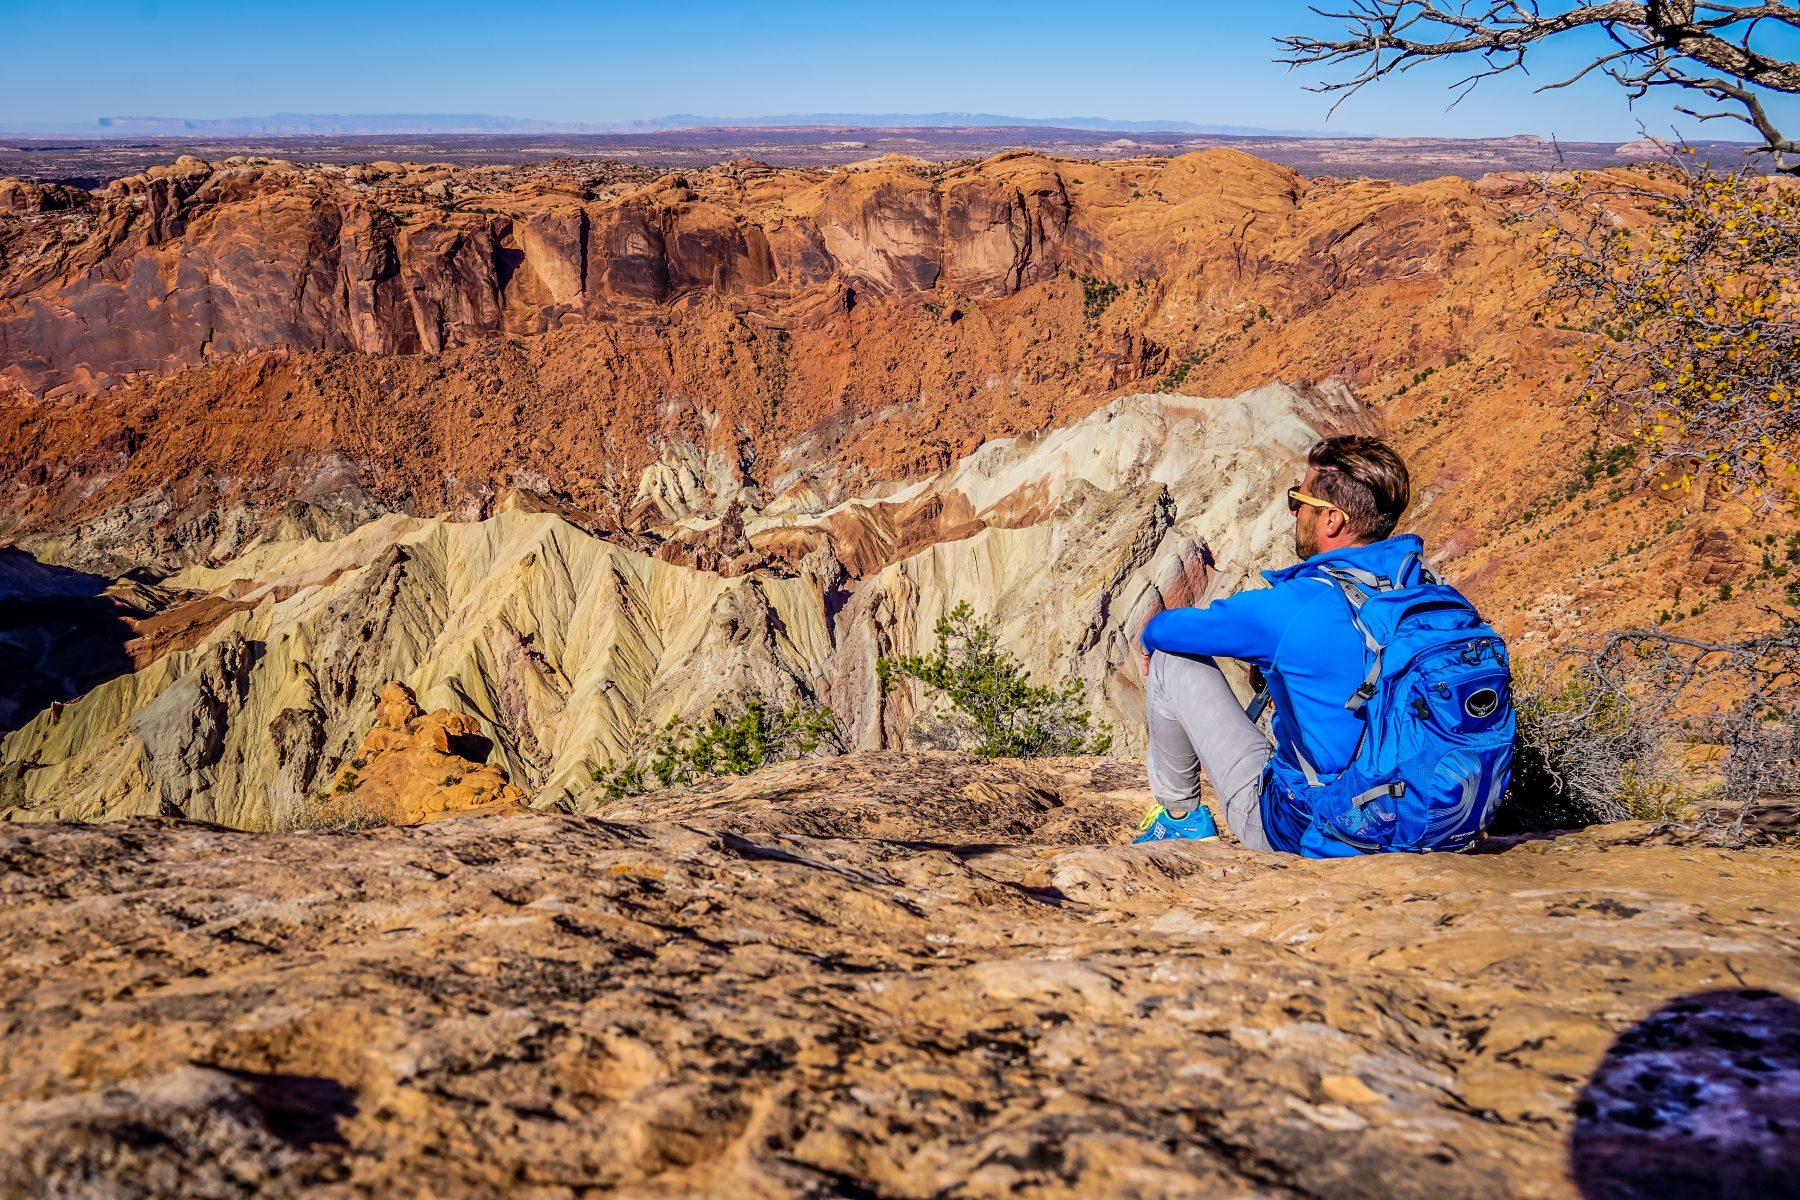 Upheaval Dome at Canyonlands National Park